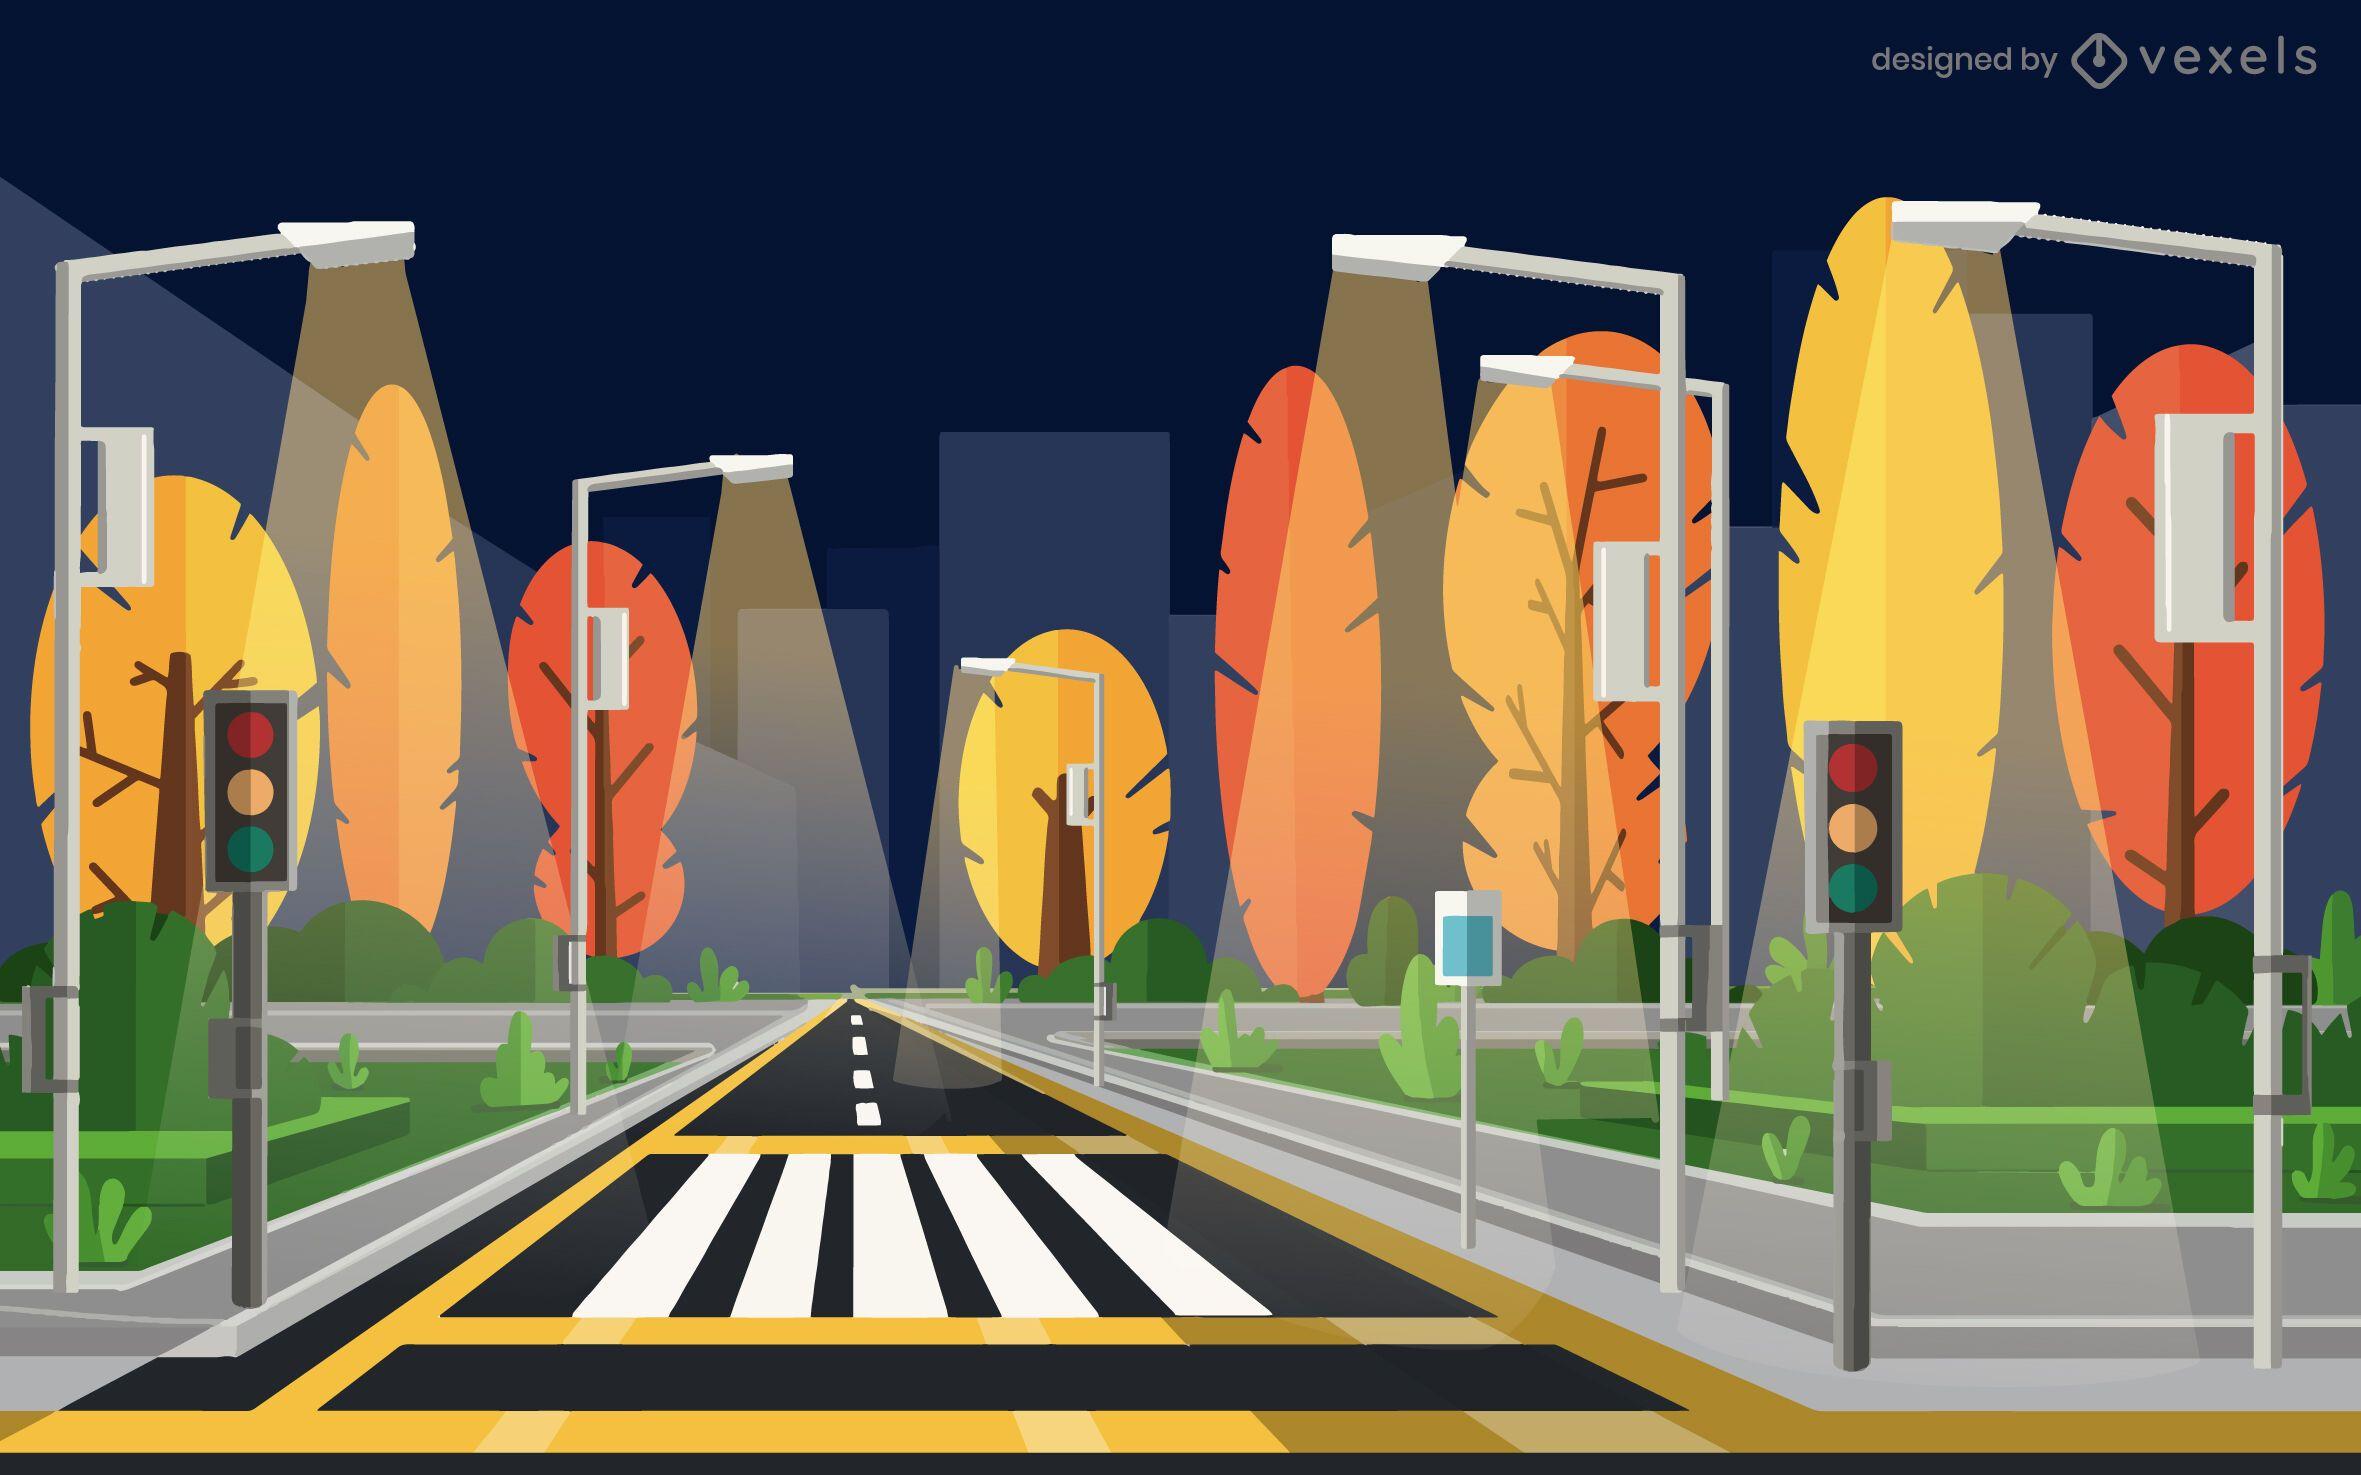 night city street illustration design